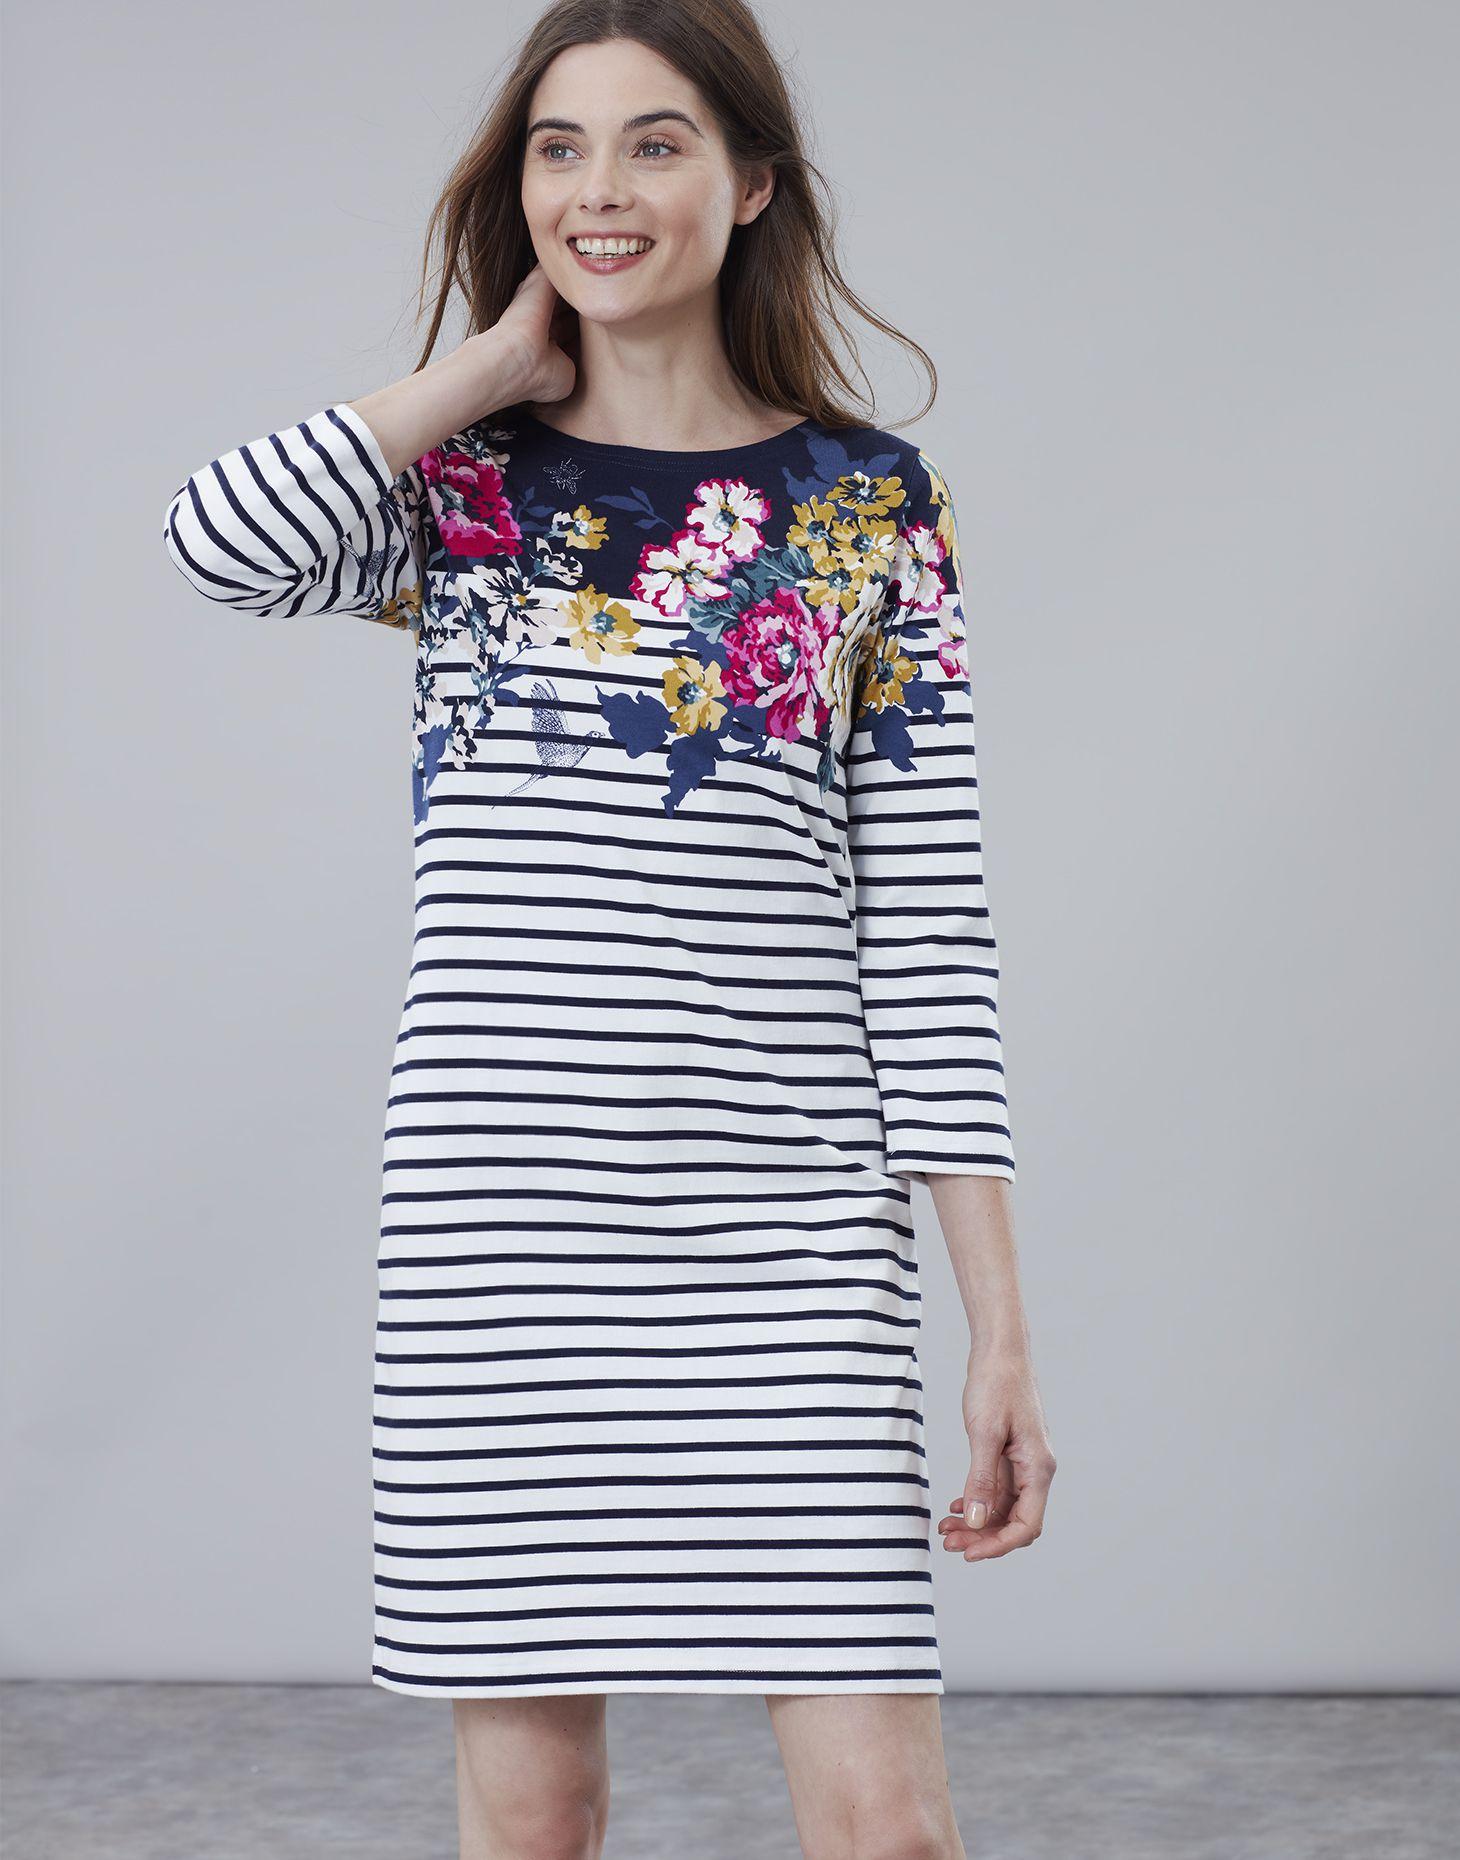 c102f352008 Riviera print ANNIVERSARY BORDER FLORAL 3/4 Sleeve Jersey Dress ...